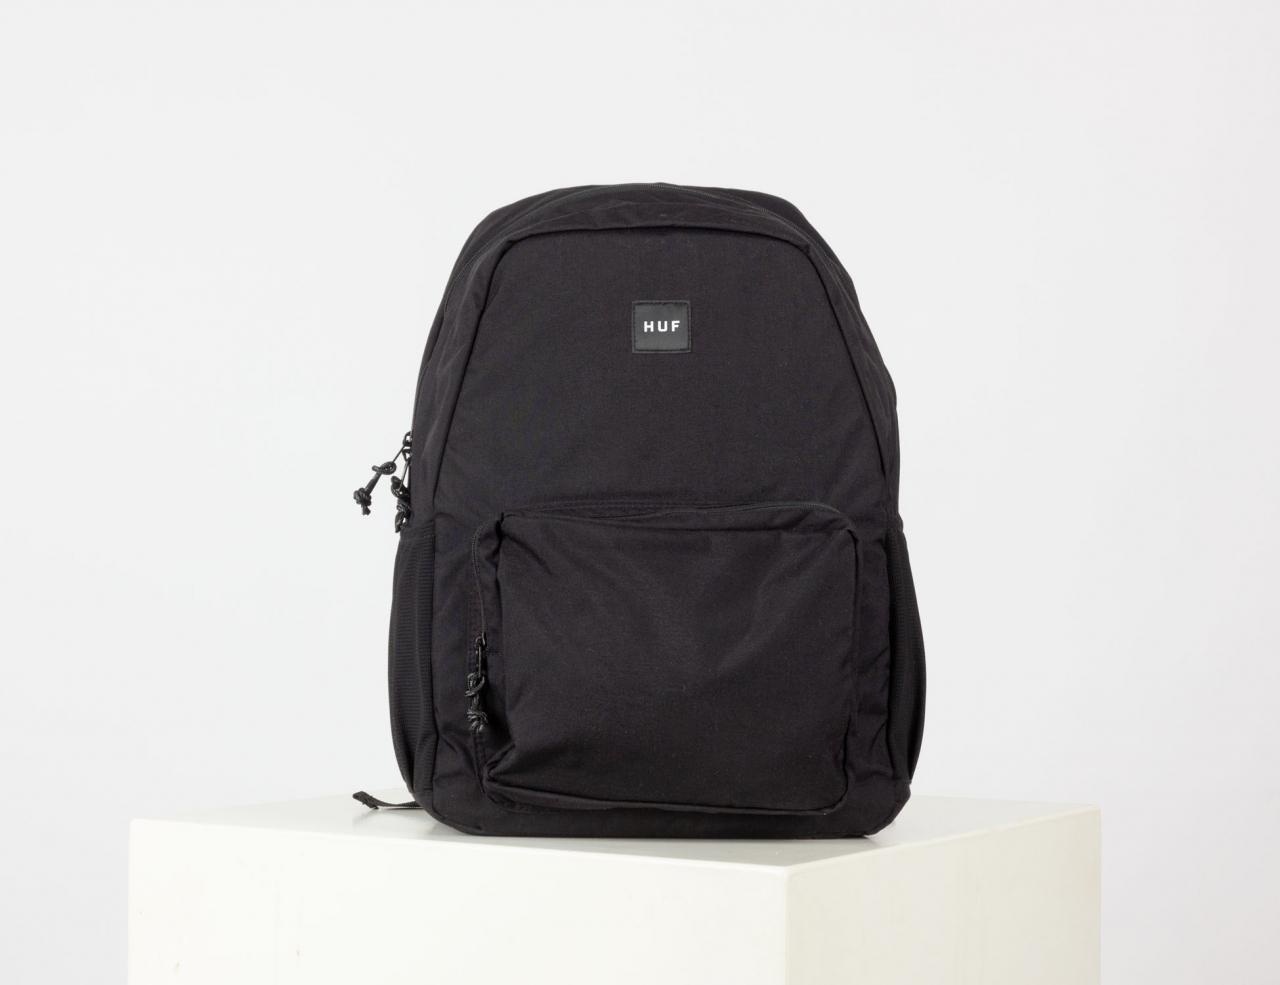 HUF Standard Issue Bag - Black